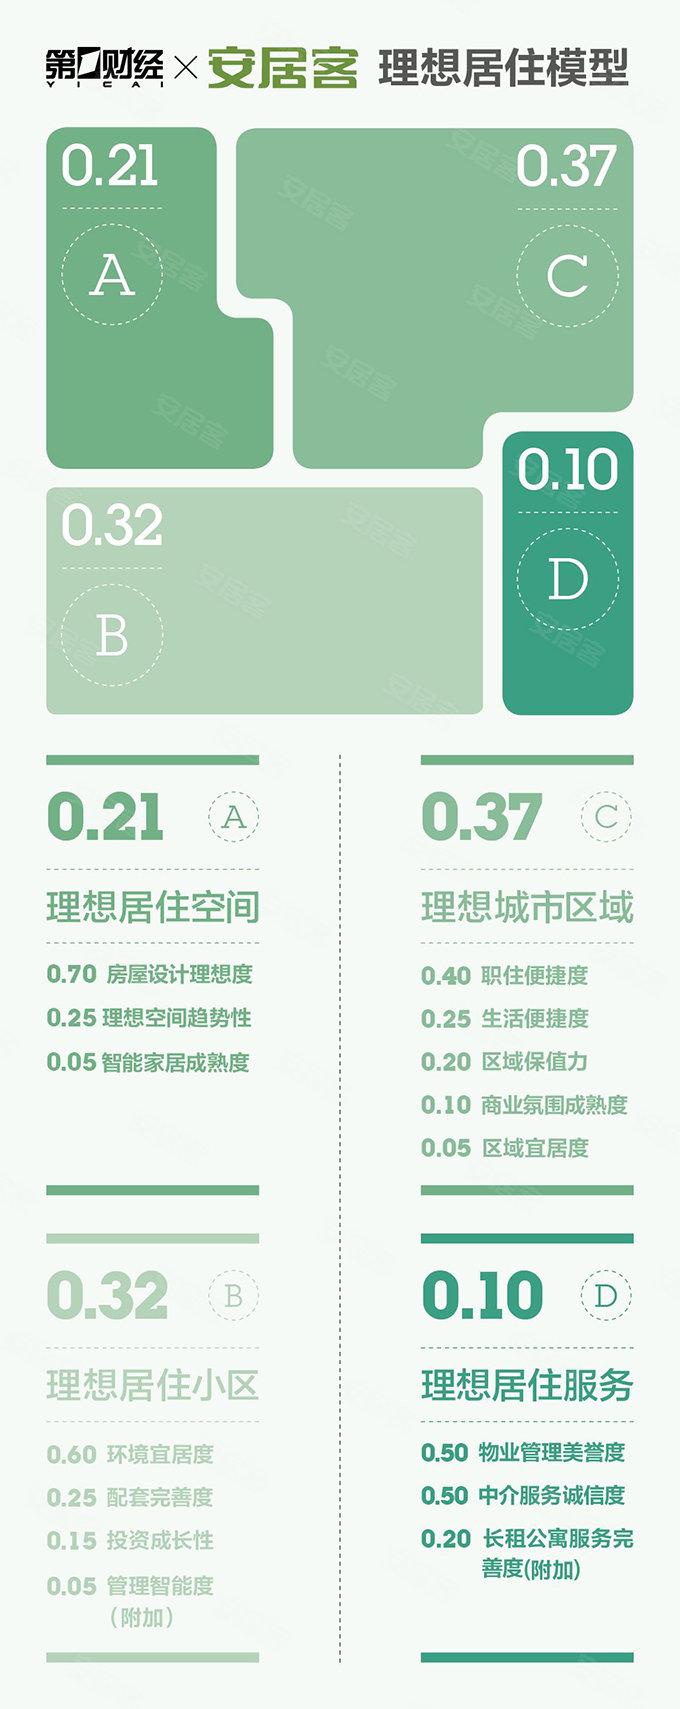 //pic1.ajkimg.com/display/xinfang/18aed092a350303925124d26c7a248c2/680x1709n.jpg插图(3)